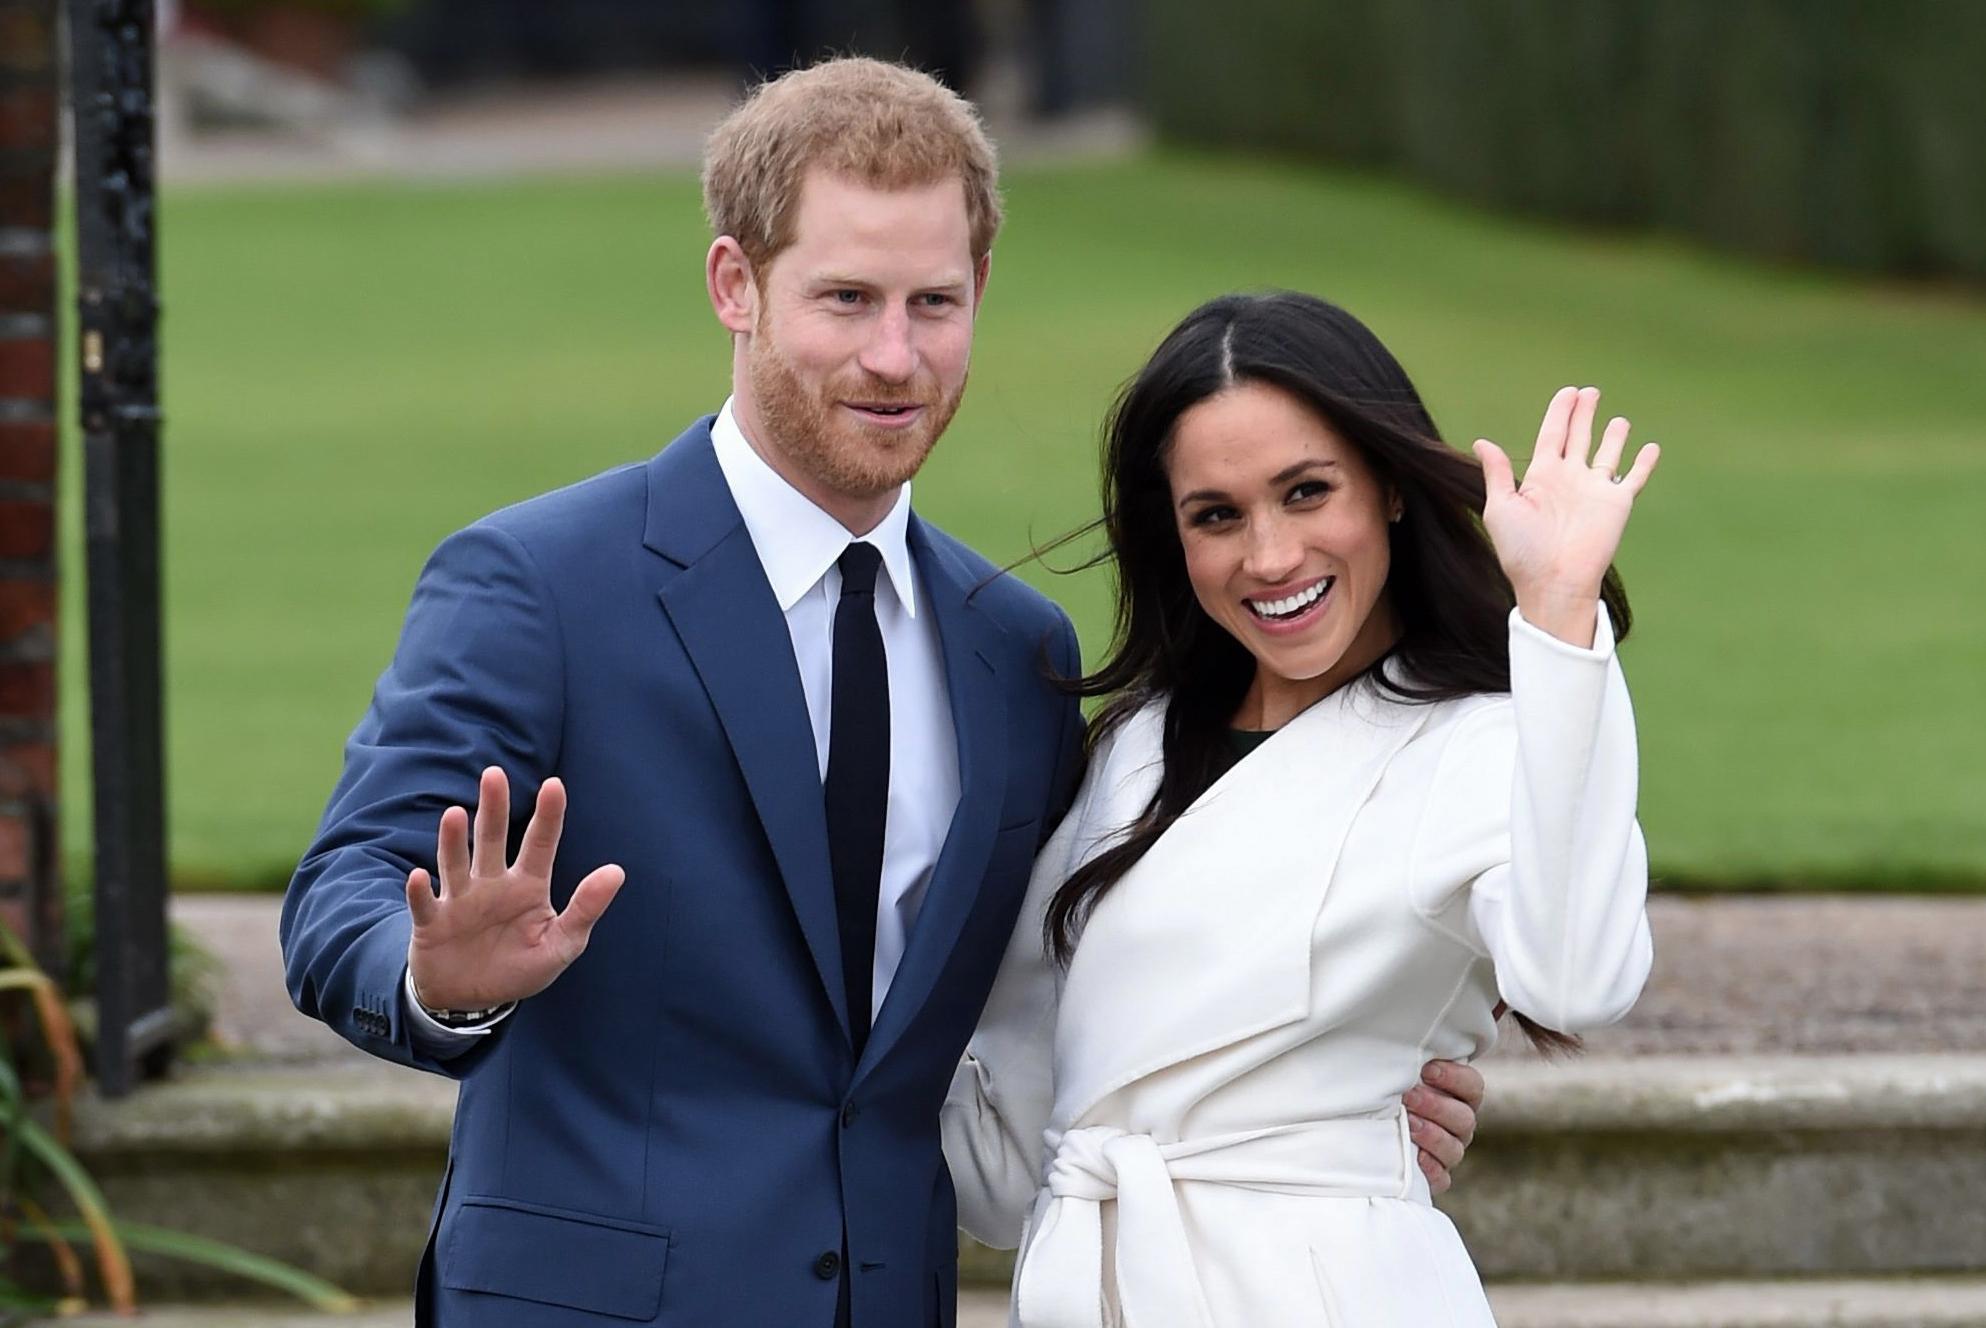 Royal_Wedding-Meghan_Markle_77446-159532.jpg54678051